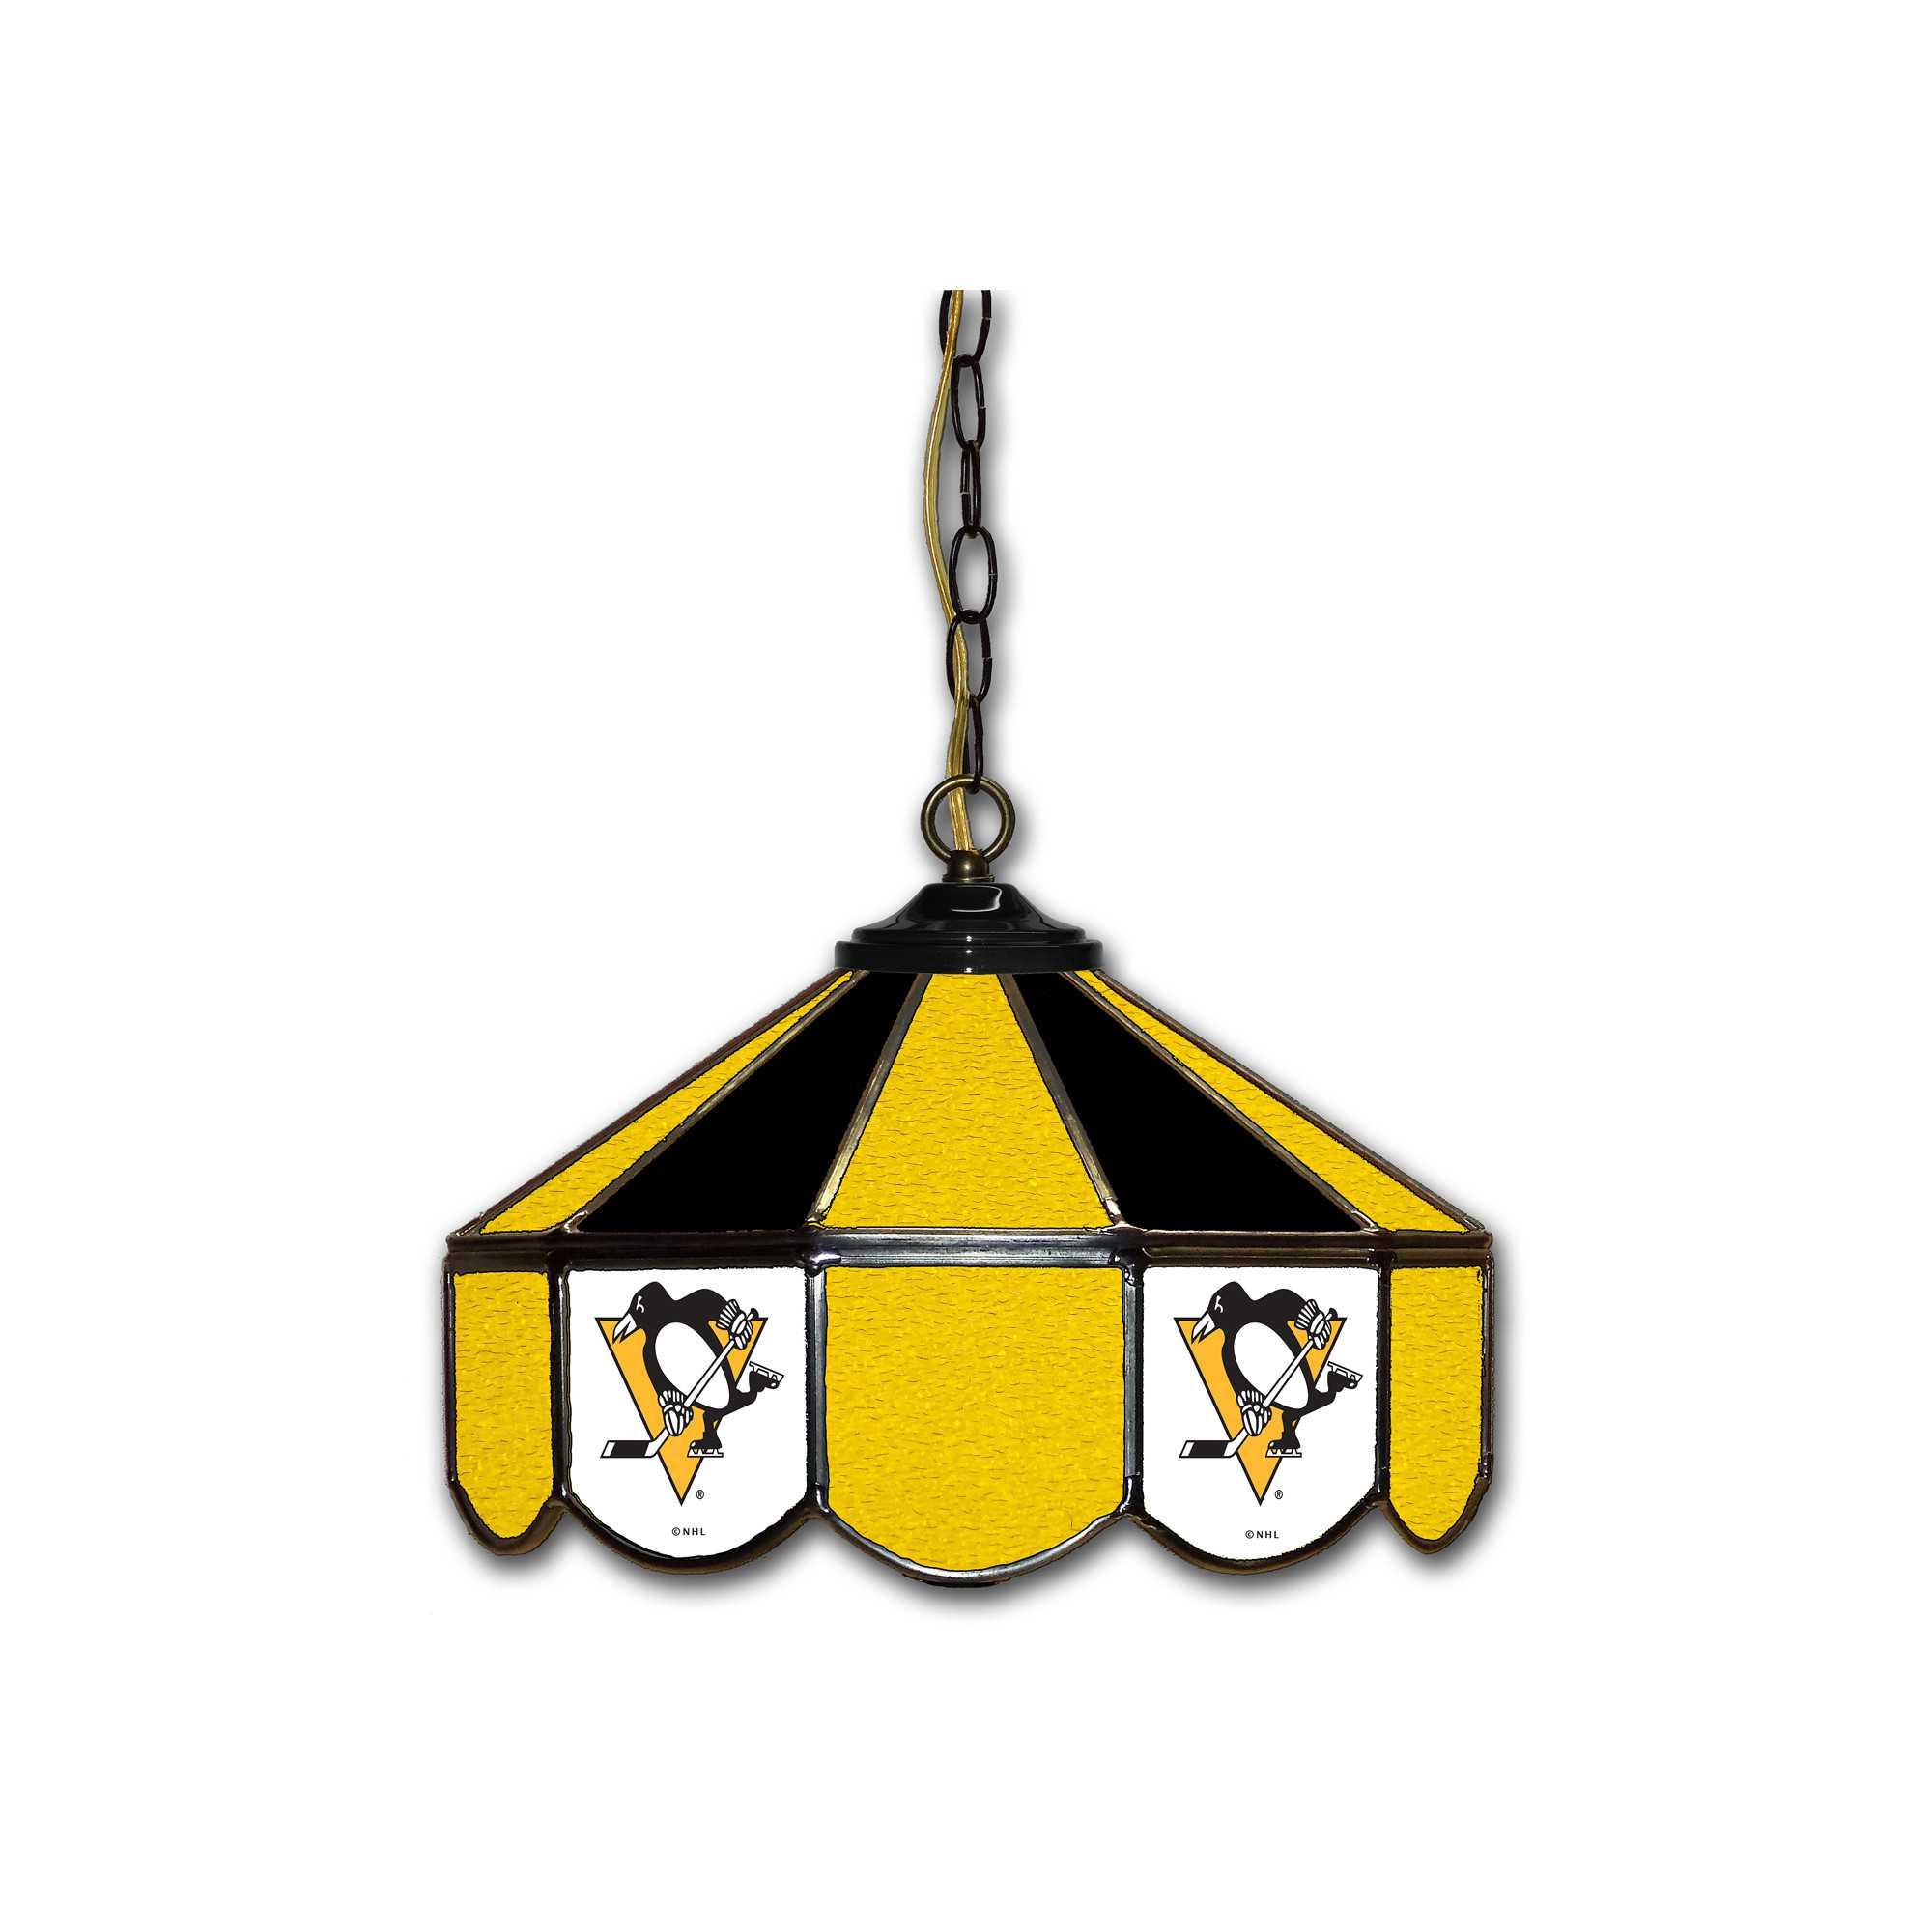 "PITTSBURGH PENGUINS 14"" GLASS PUB LAMP"